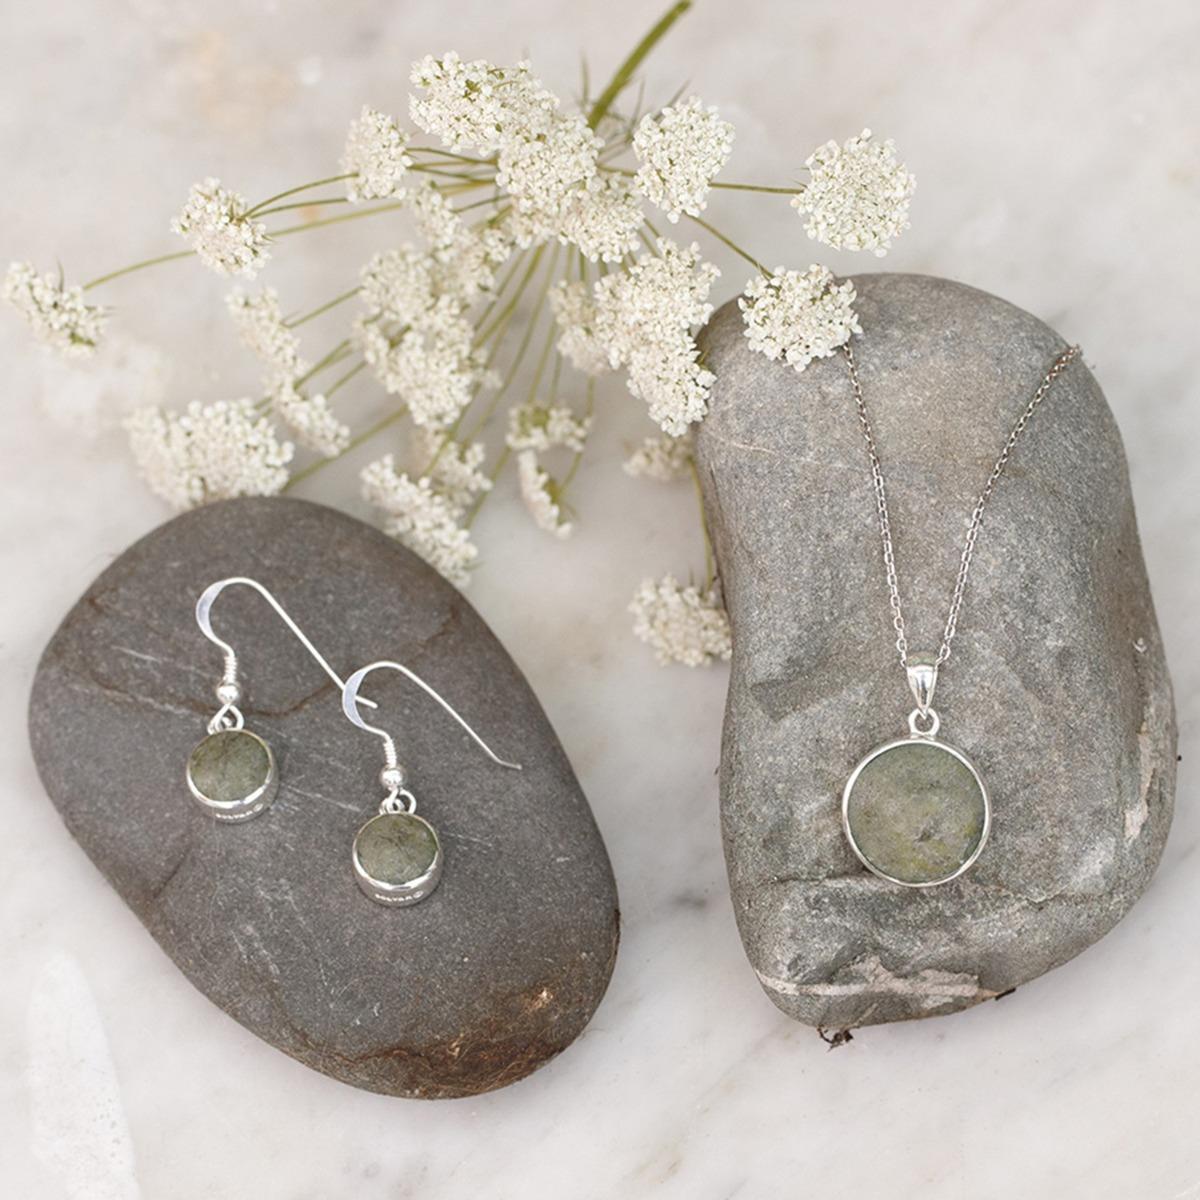 Connemara Marble jewelry set